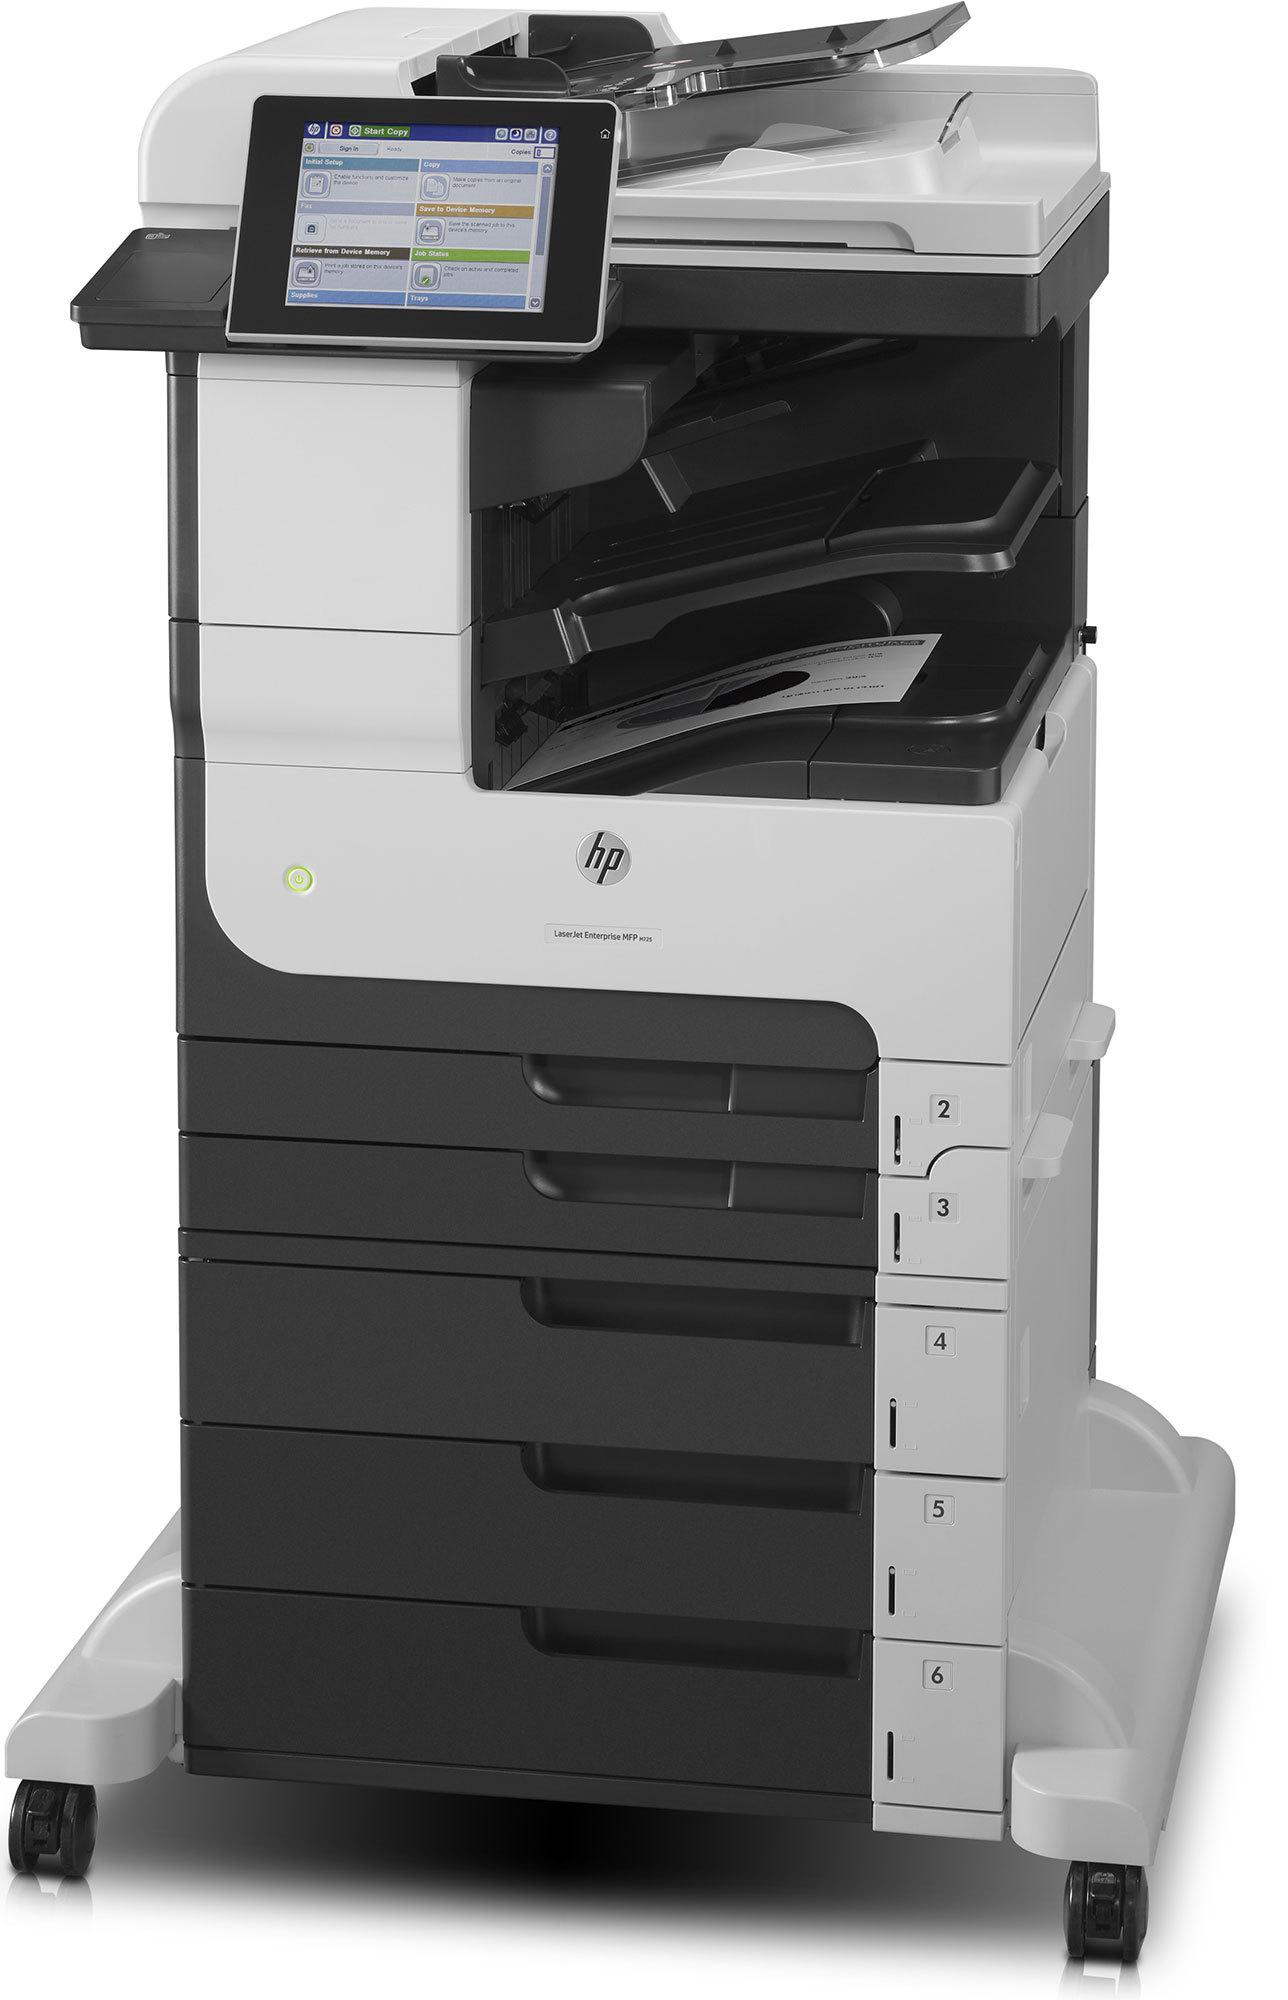 HP LaserJet Enterprise 700 color series